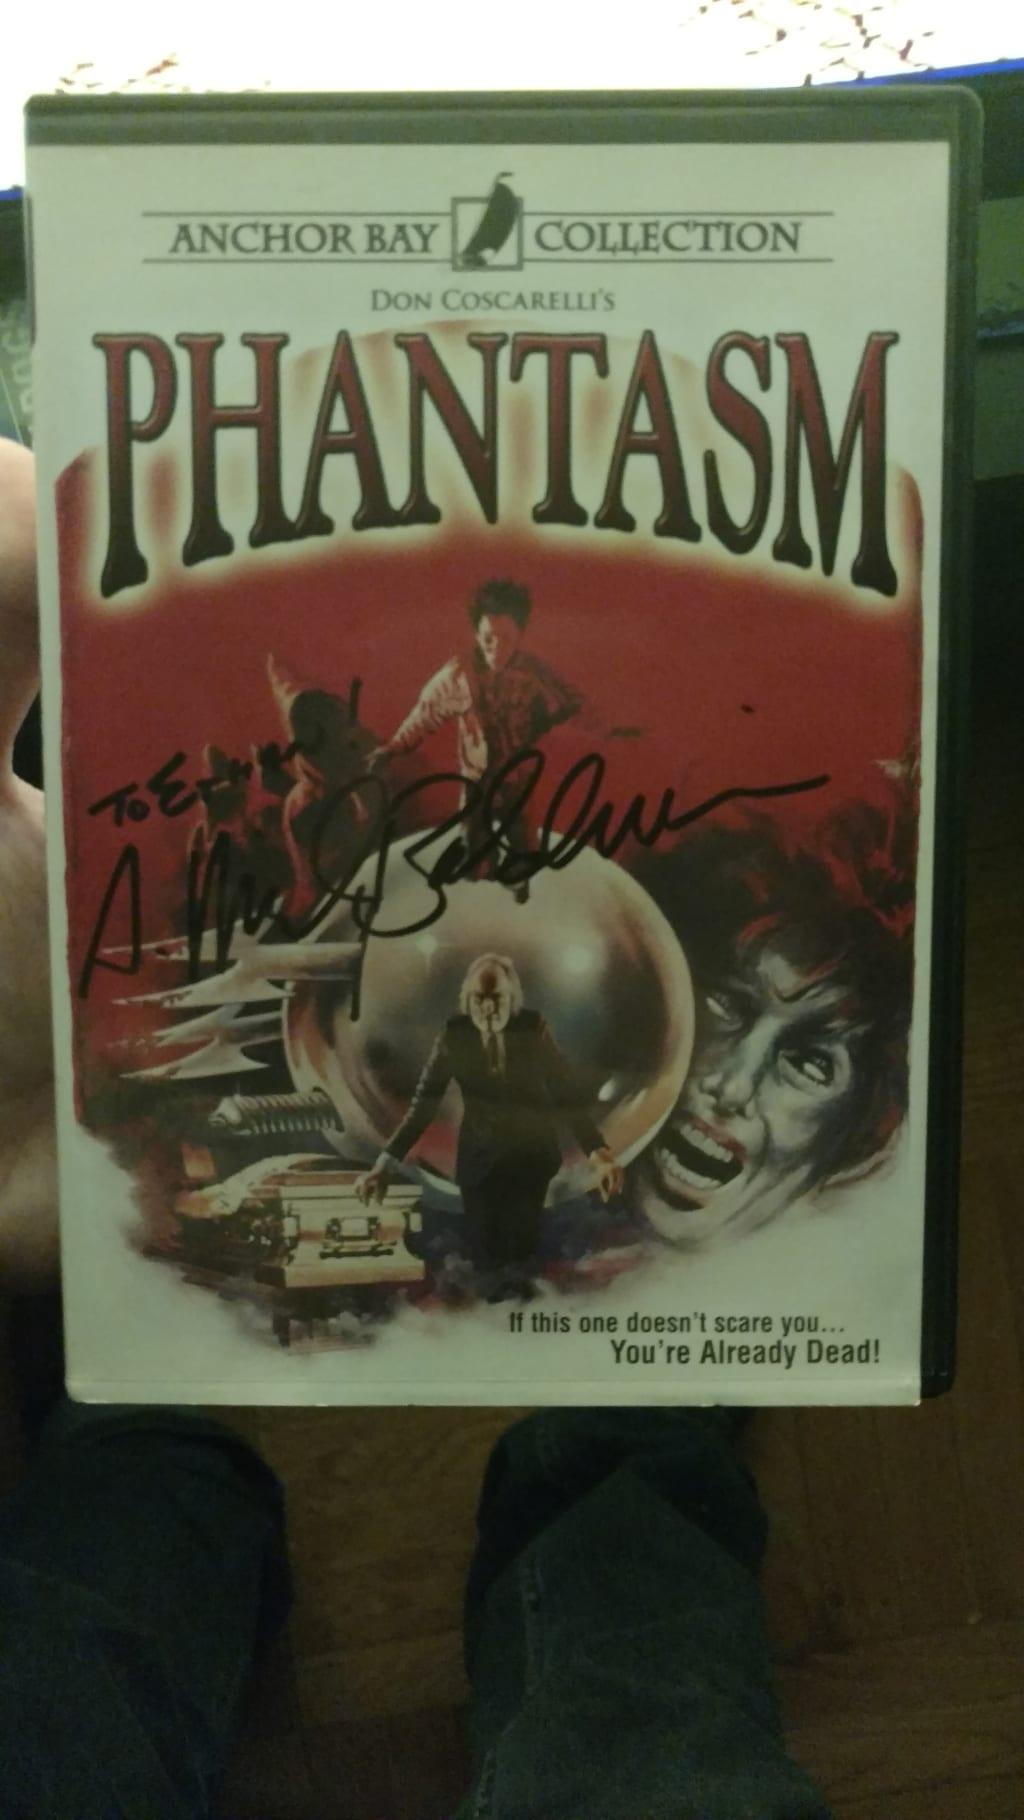 My In-depth Review/Retrospective of Phantasm